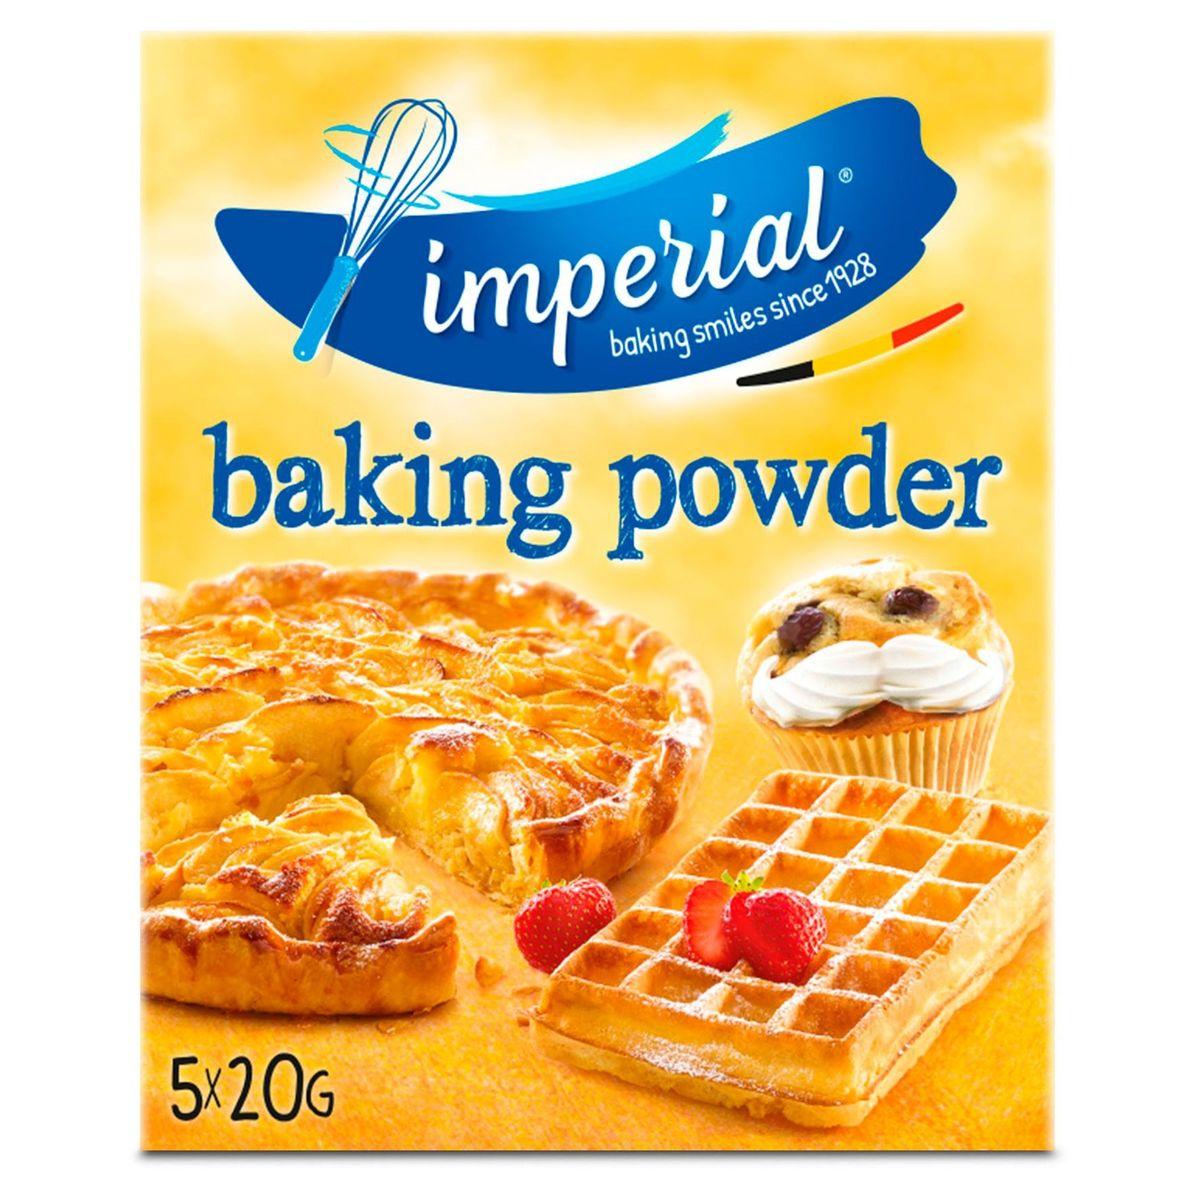 Imperial Baking Powder 5 x 20 g